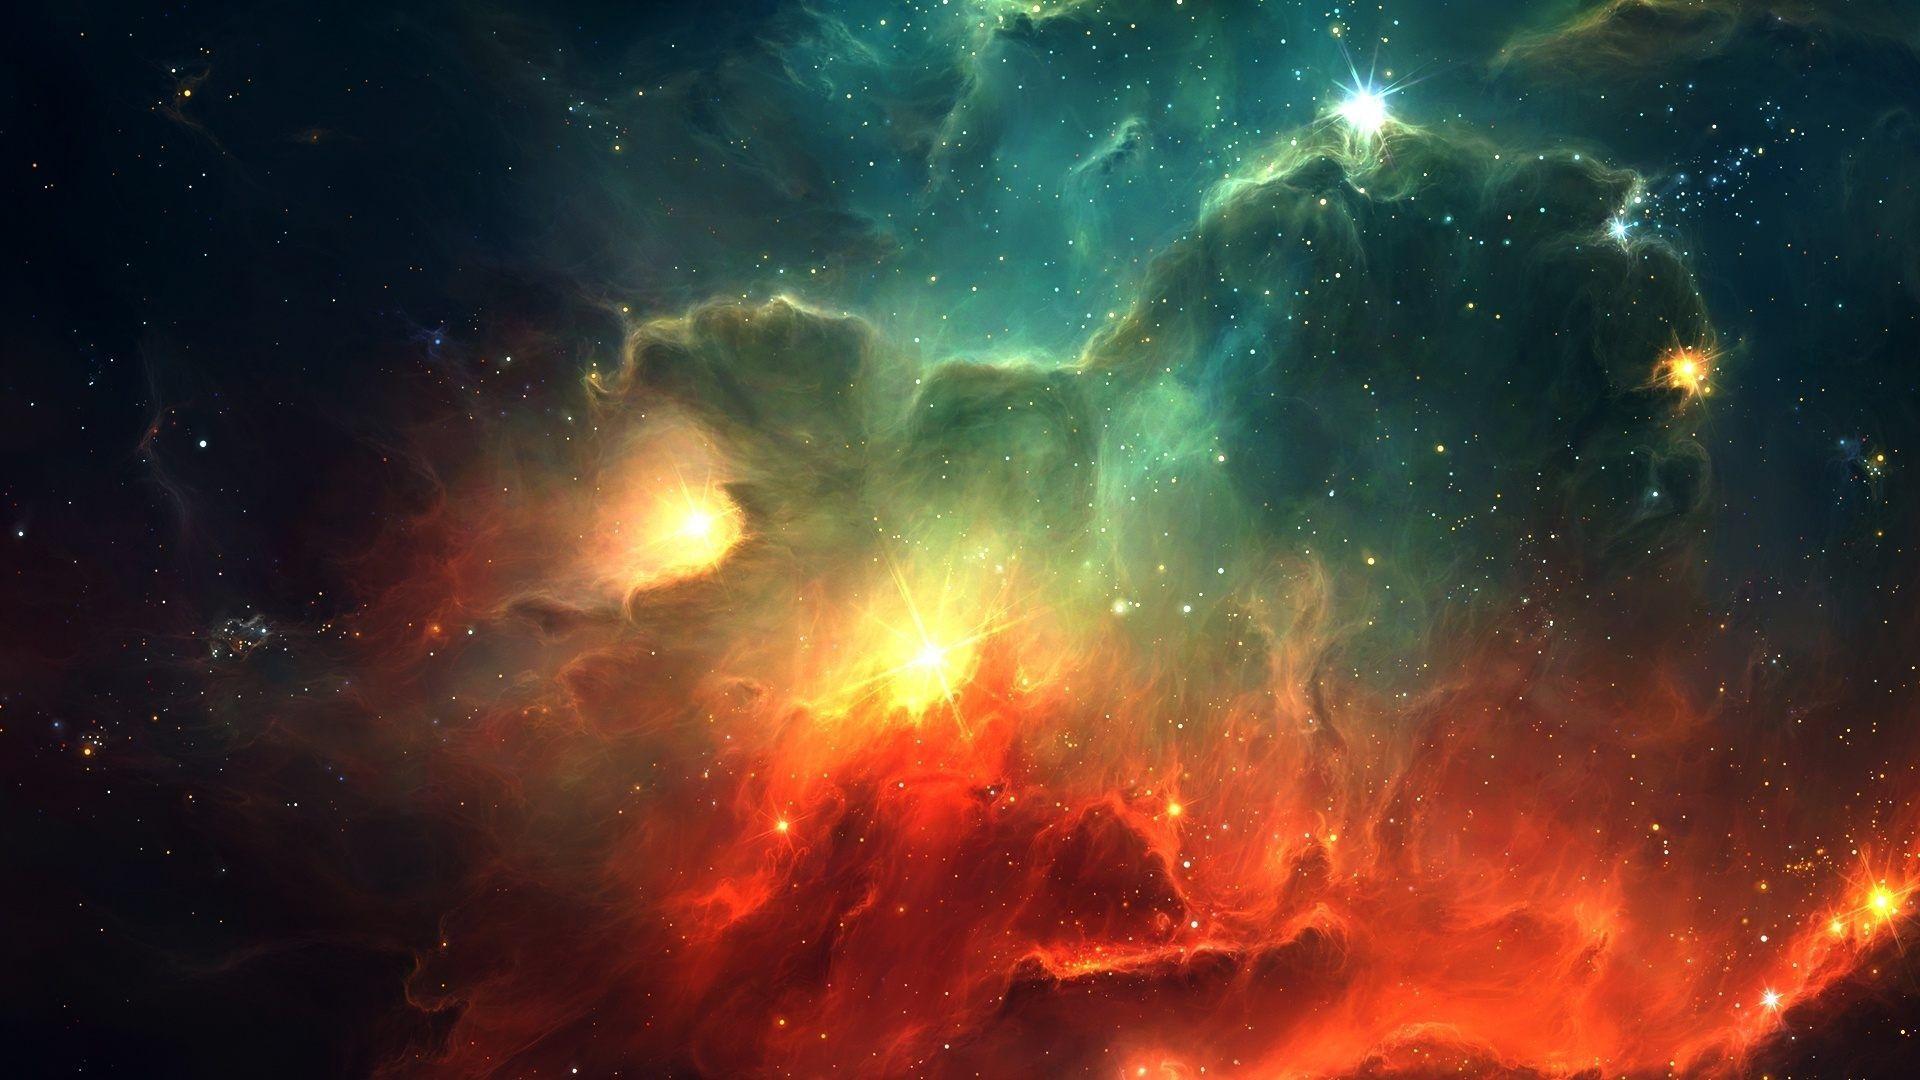 starfield universe wallpaper | ololoshenka | pinterest | universe